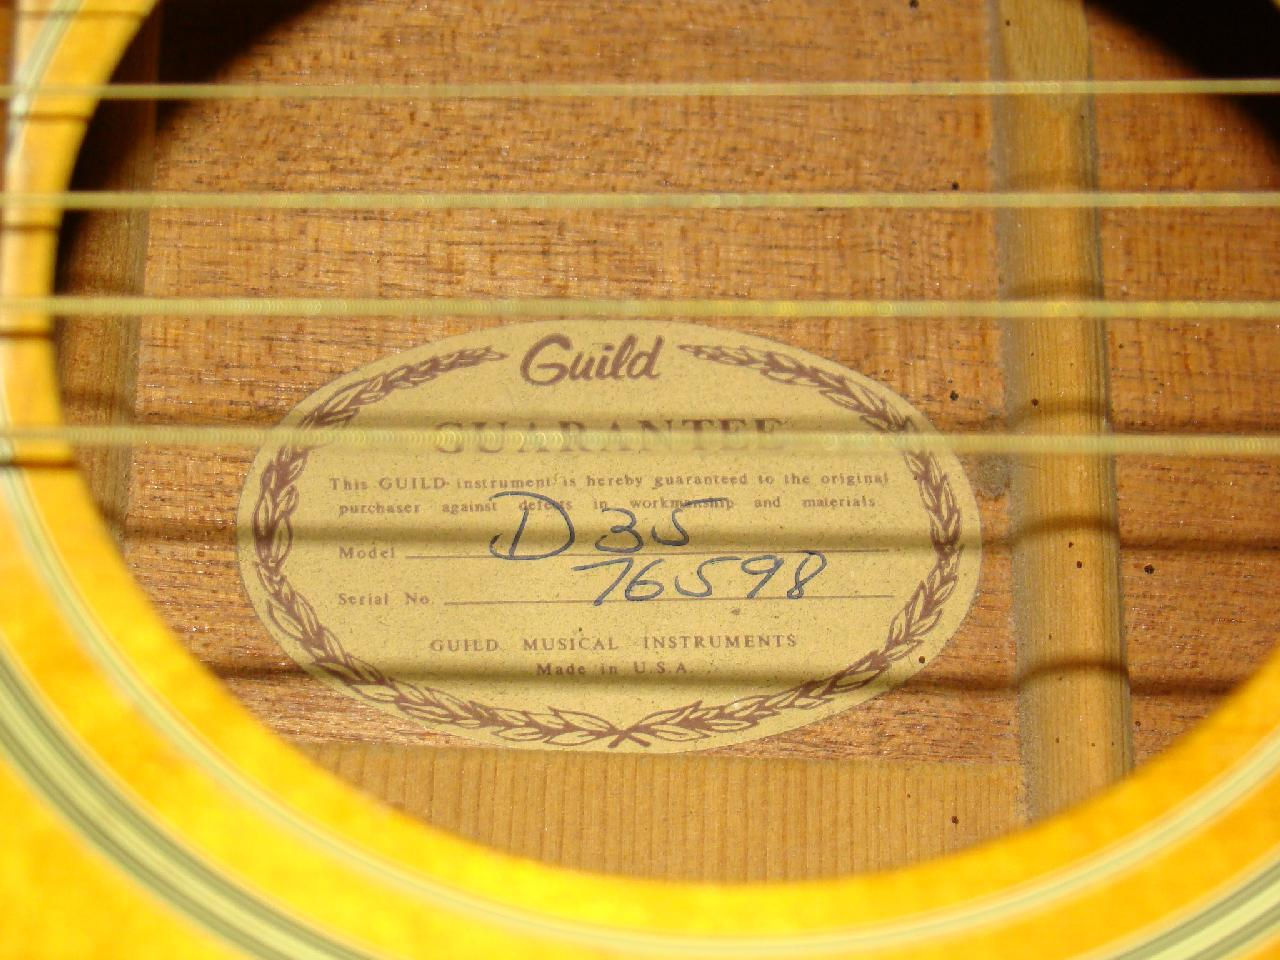 Guild d35 dating